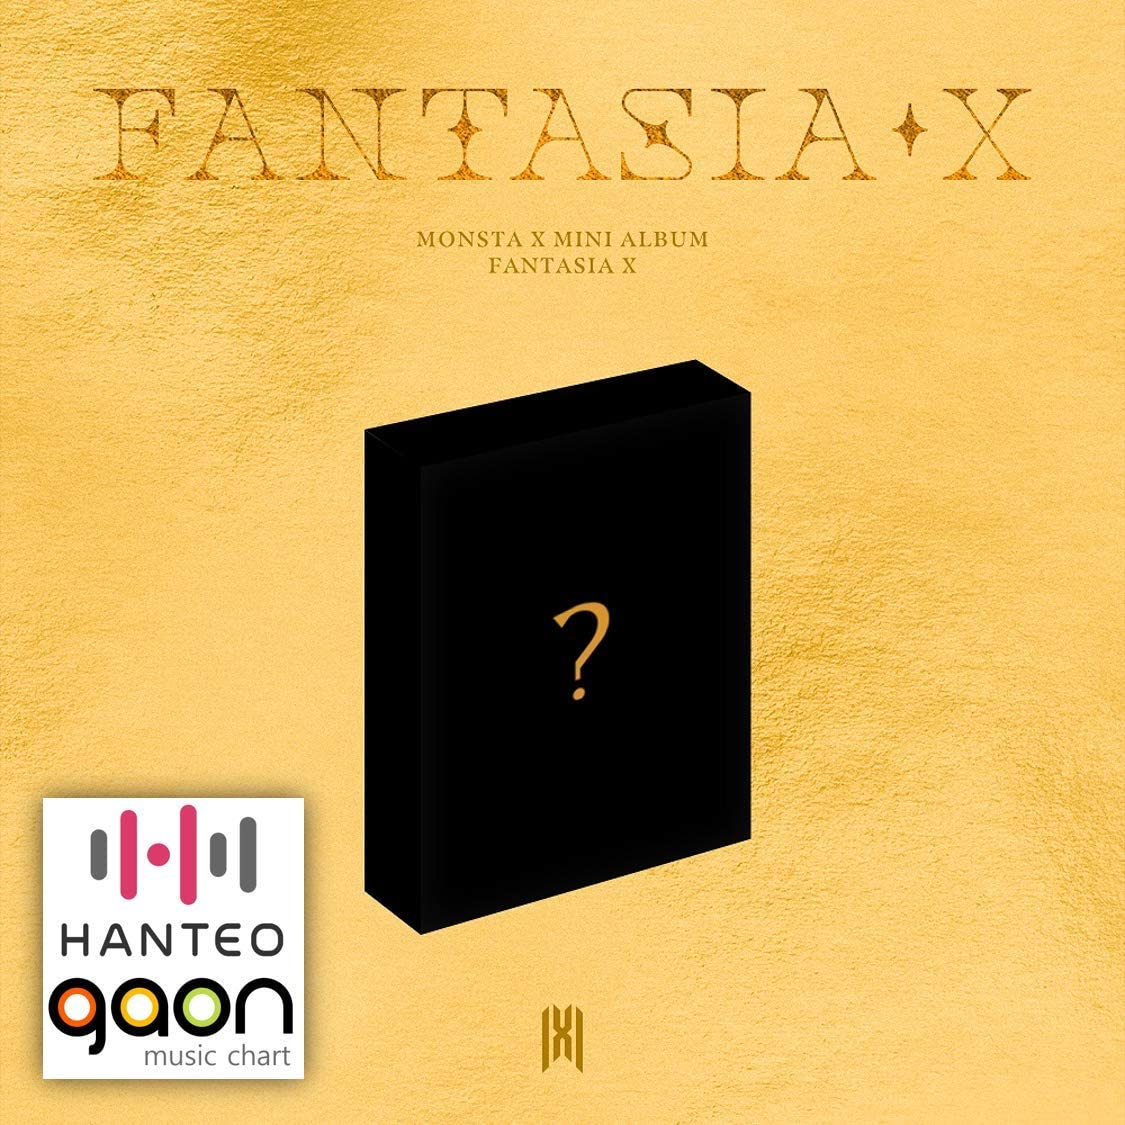 Monsta X - Fantasia X (Kit Album) [Pre Order] Album Package with Extra Decorative Sticker Set, Photocard Set